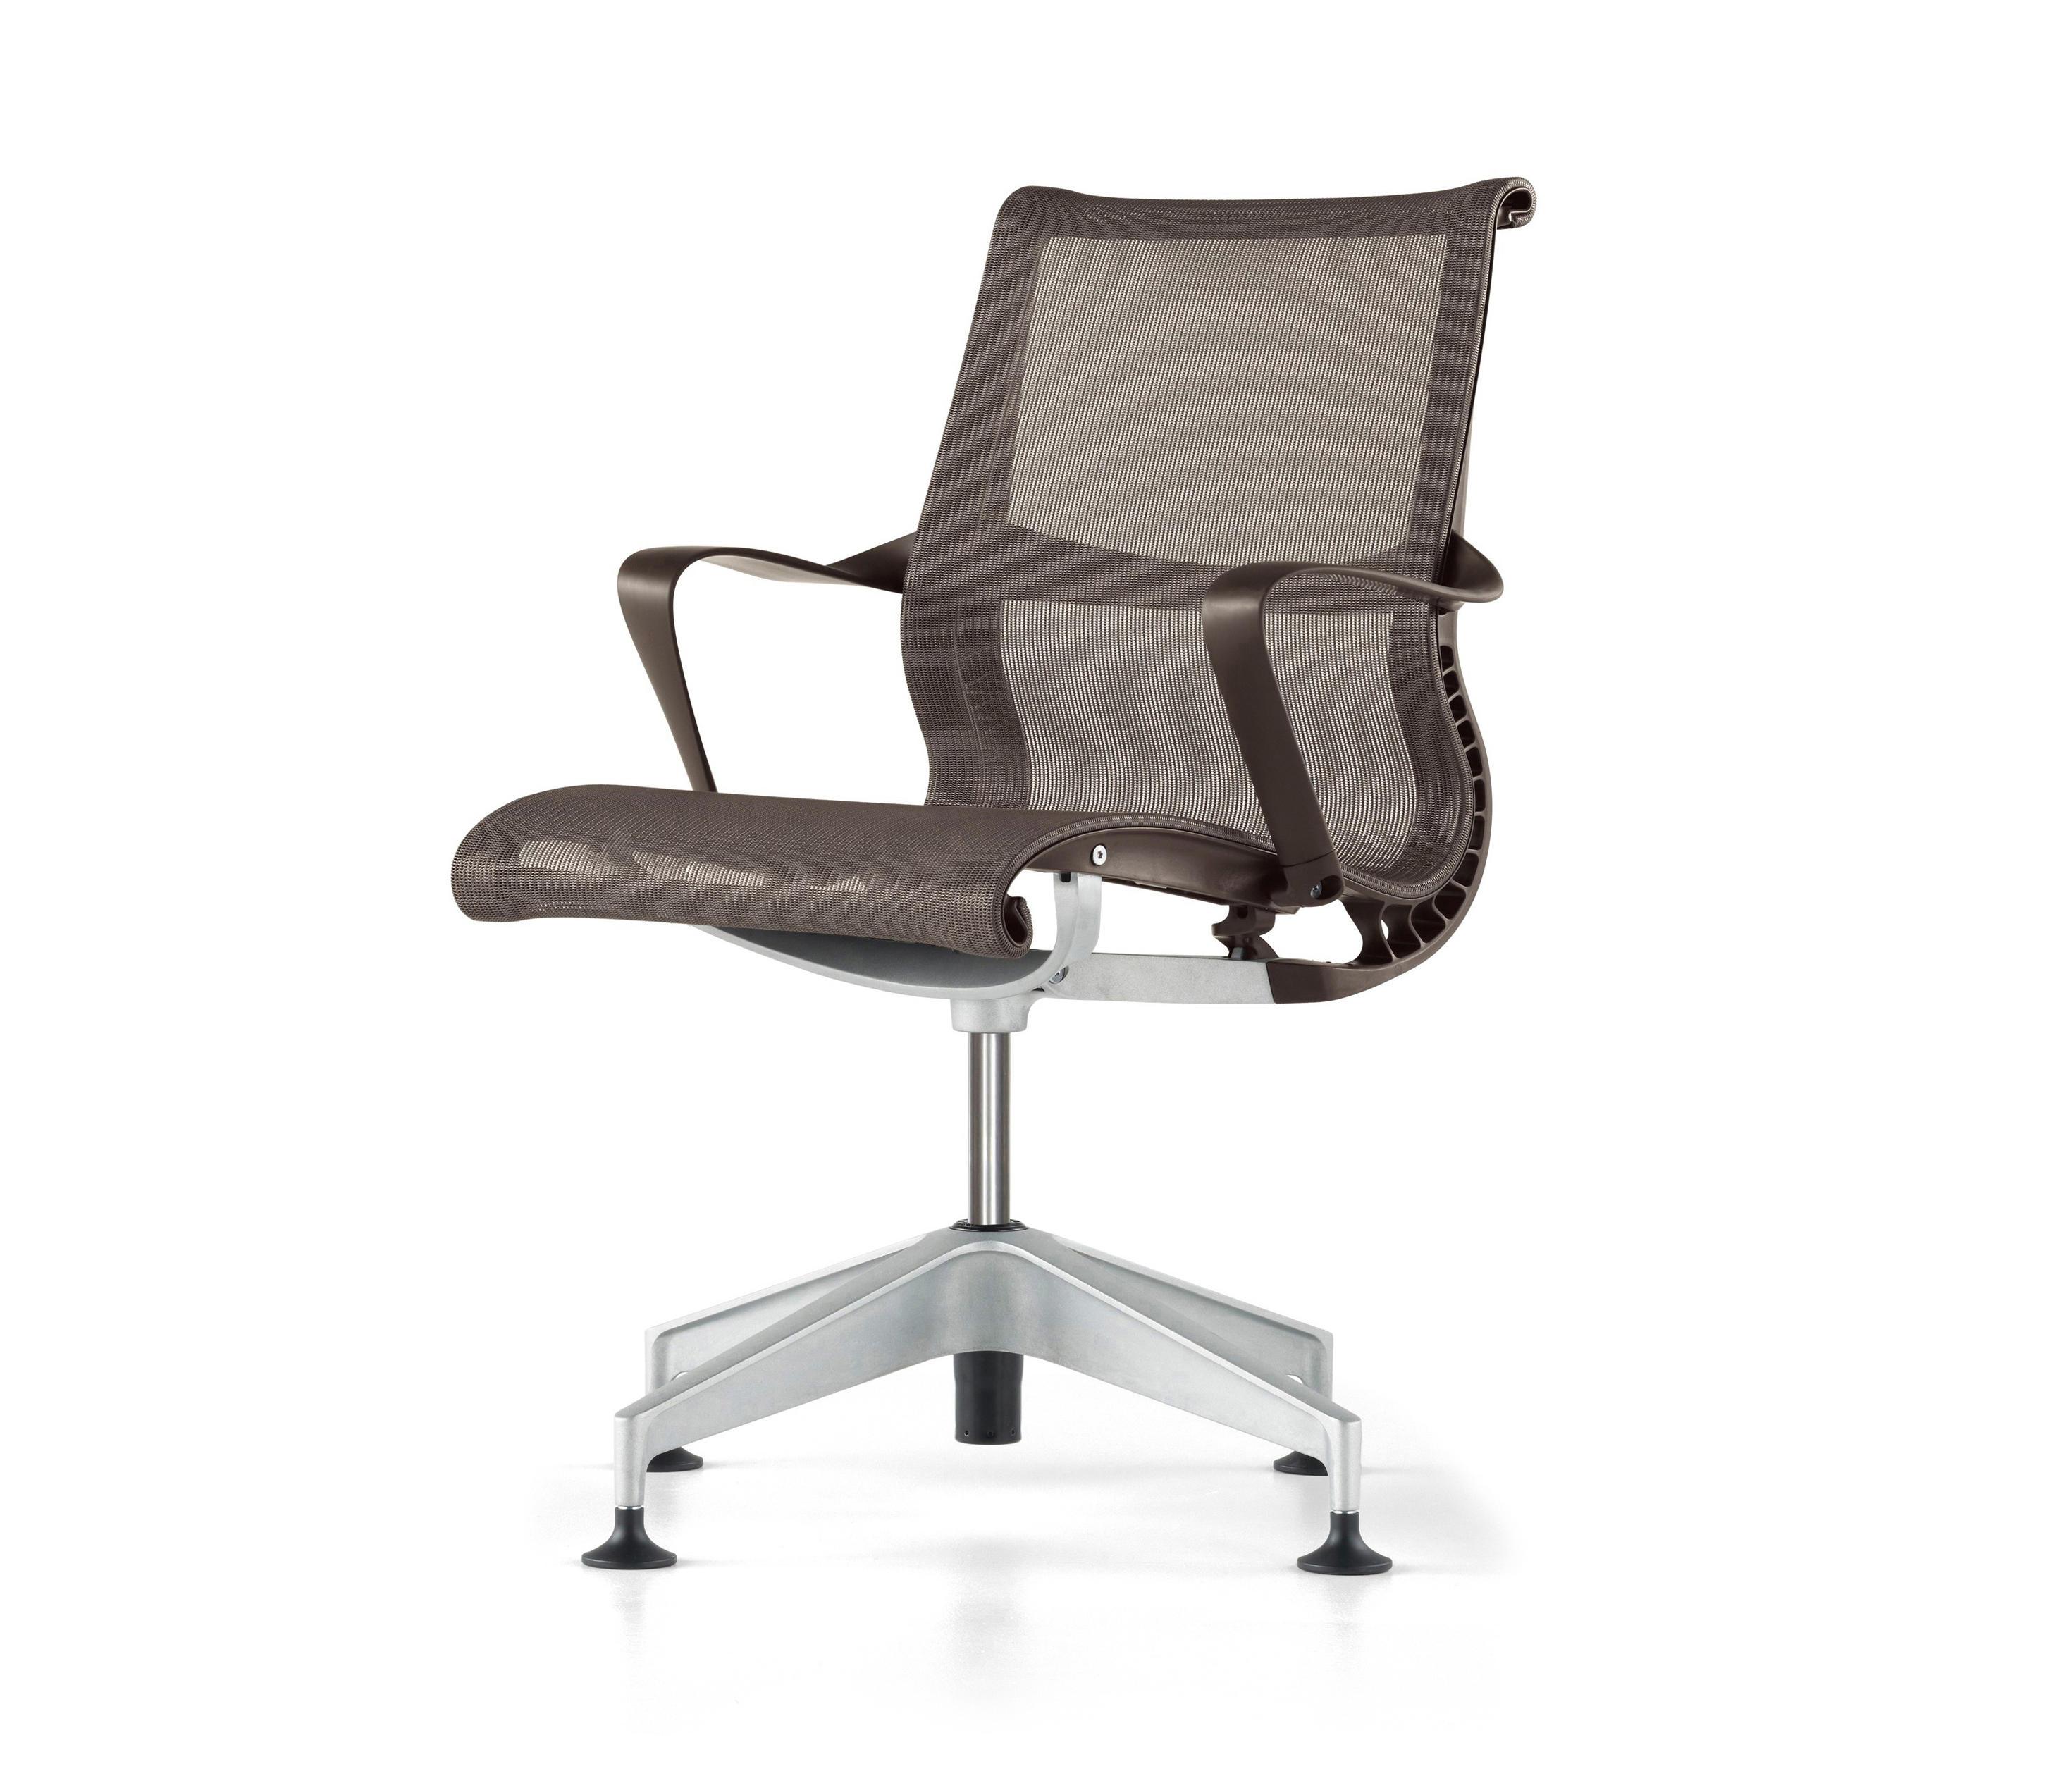 SETU STUHL   Stühle von Herman Miller   Architonic